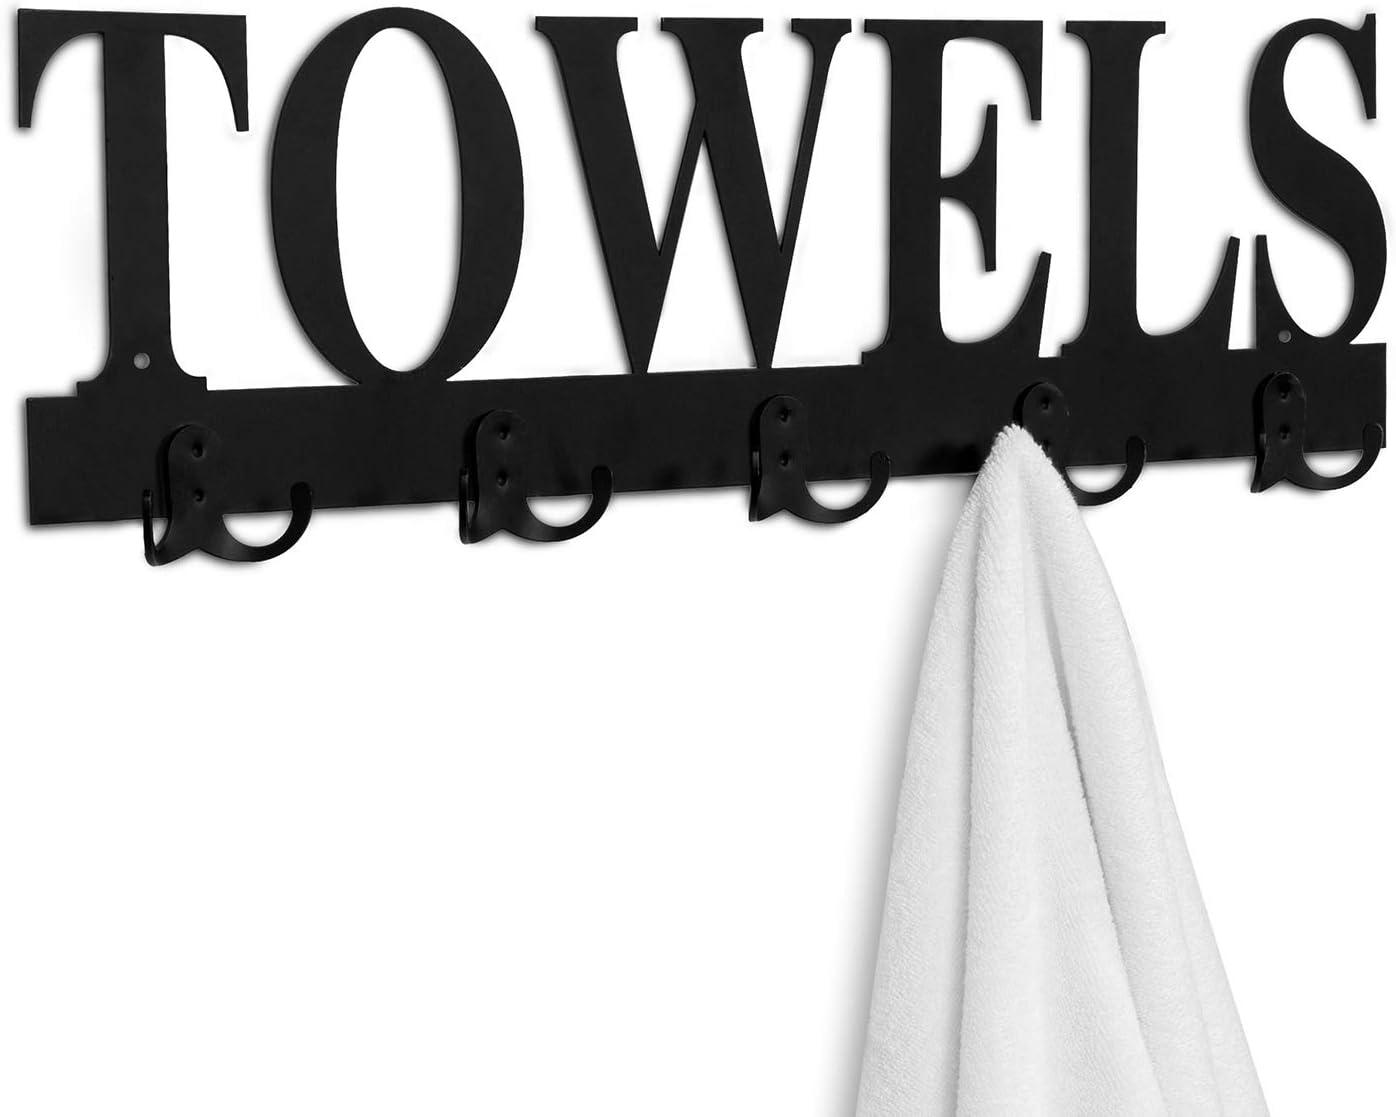 Towel Hooks Reusable Ø 5,5 cm U-Fix Metaltex Window Hook Wall Hook